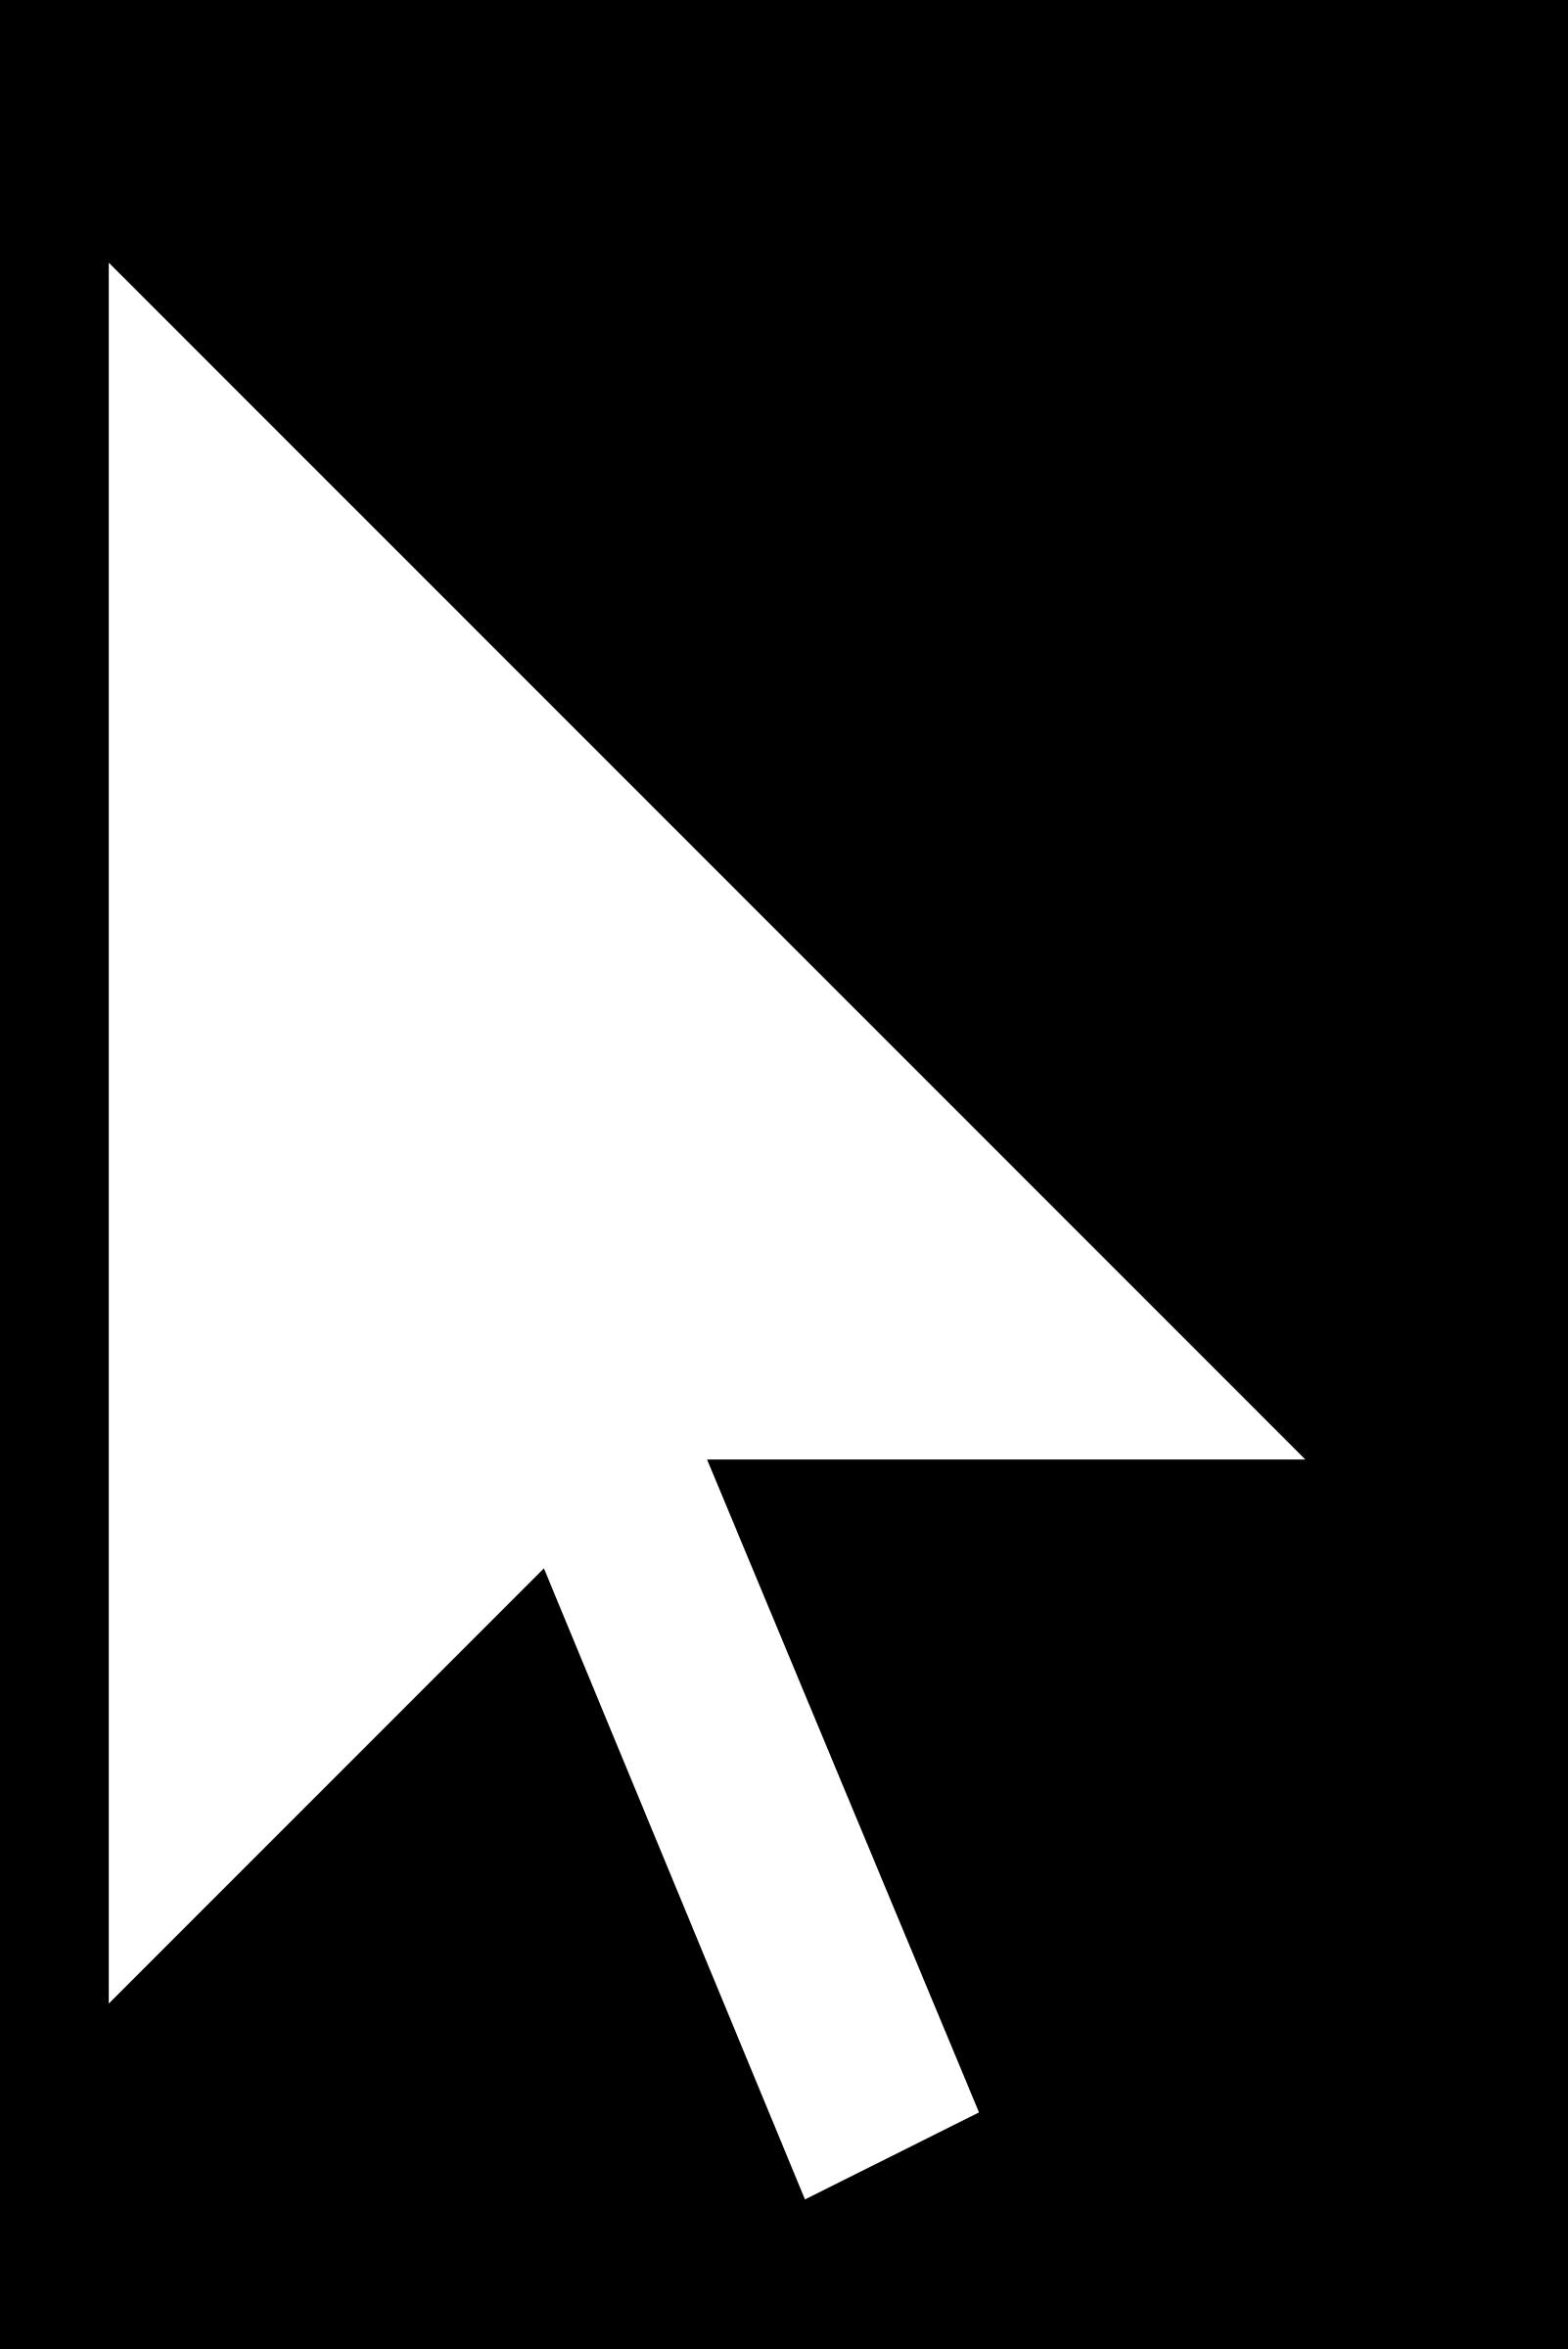 Mouse cursor PNG images free download | 1602 x 2400 png 29kB